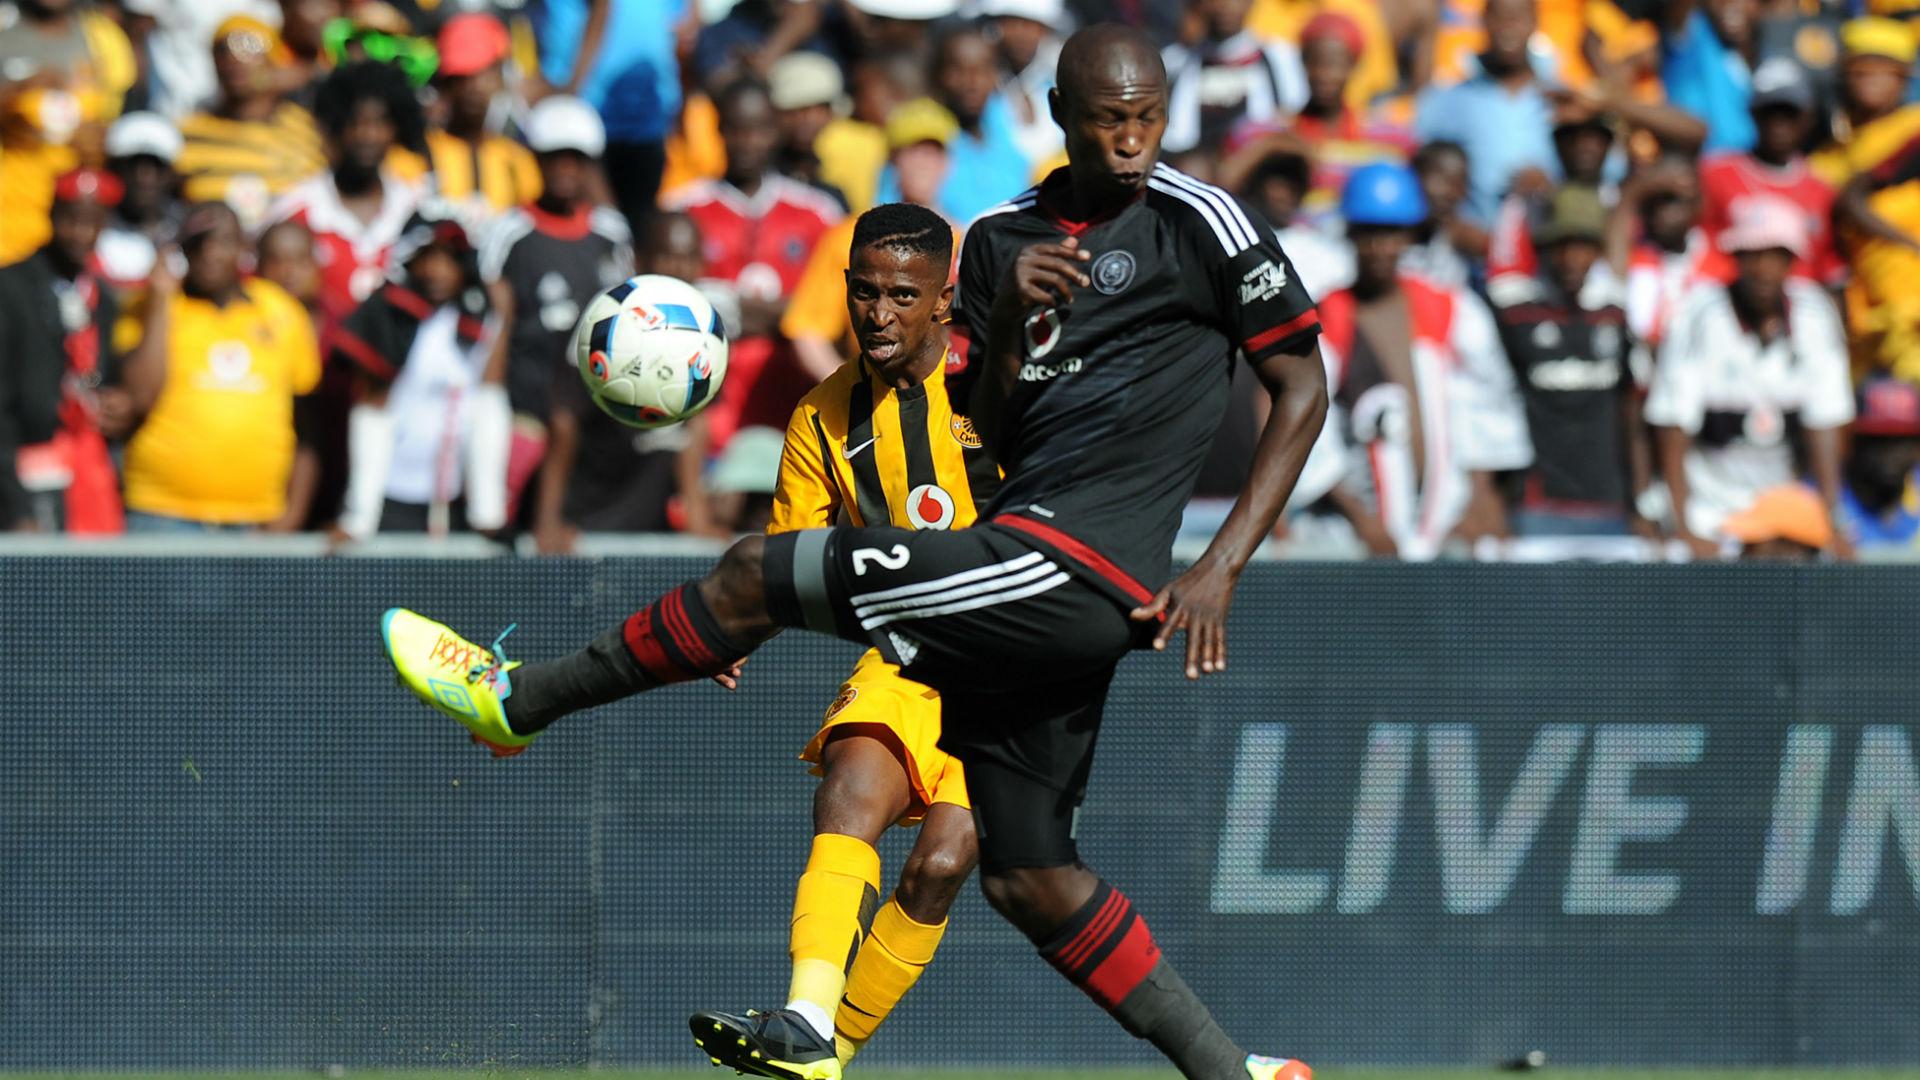 Ayanda Gcaba and William Twala - Pirates v Chiefs